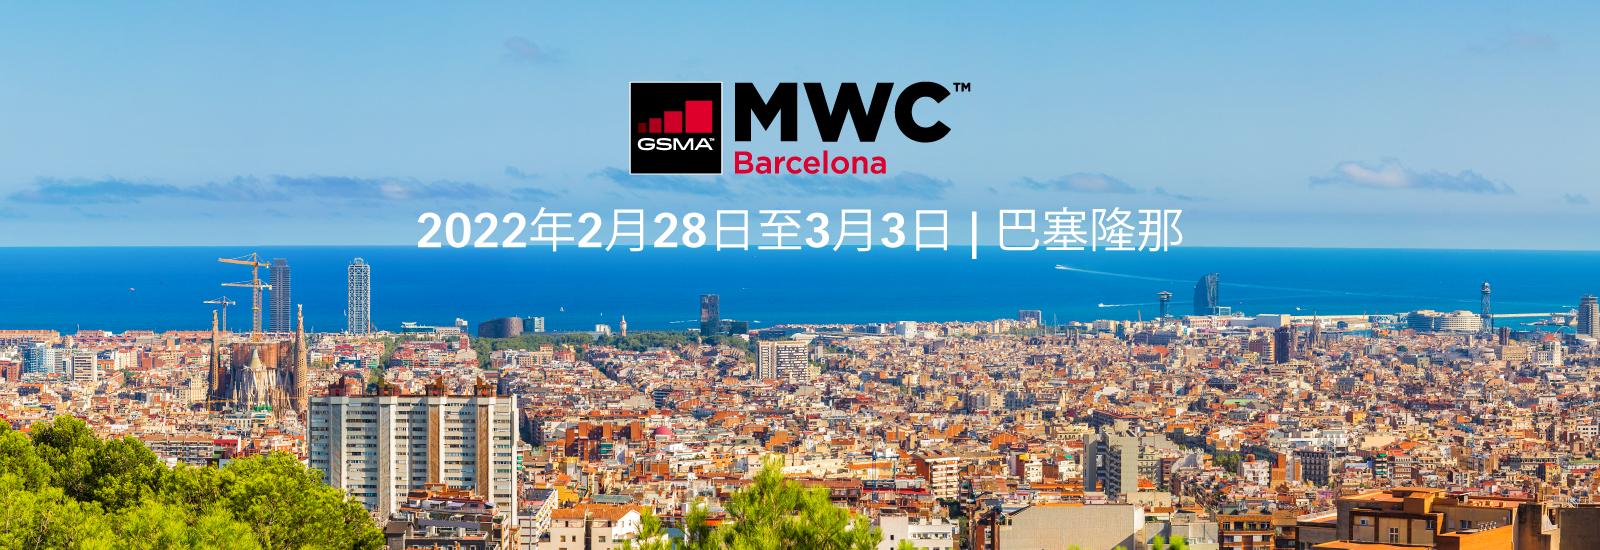 ProgressSoft將參加MWC 2022巴賽隆納展